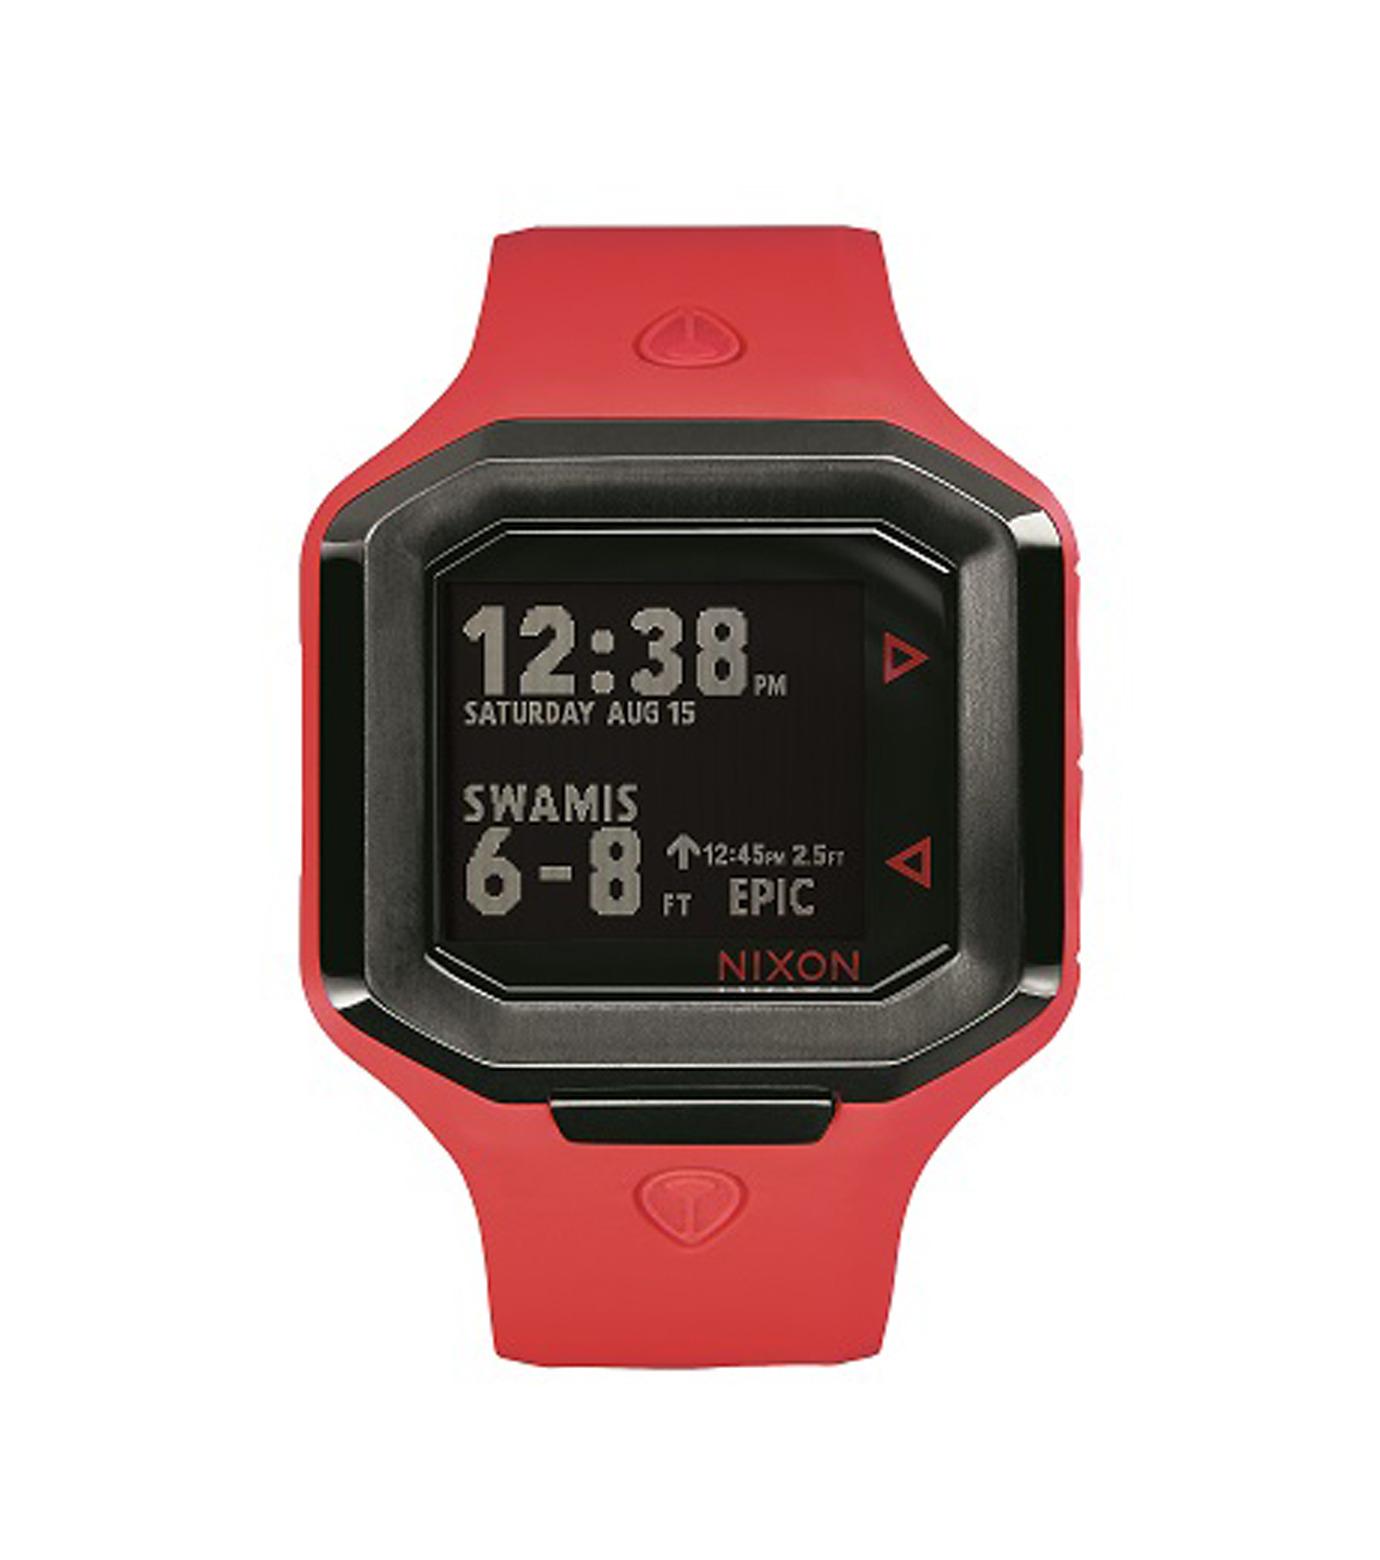 Nixon(ニクソン)のULTRATIDE-RED(ウォッチ/watch)-A476-62 拡大詳細画像1